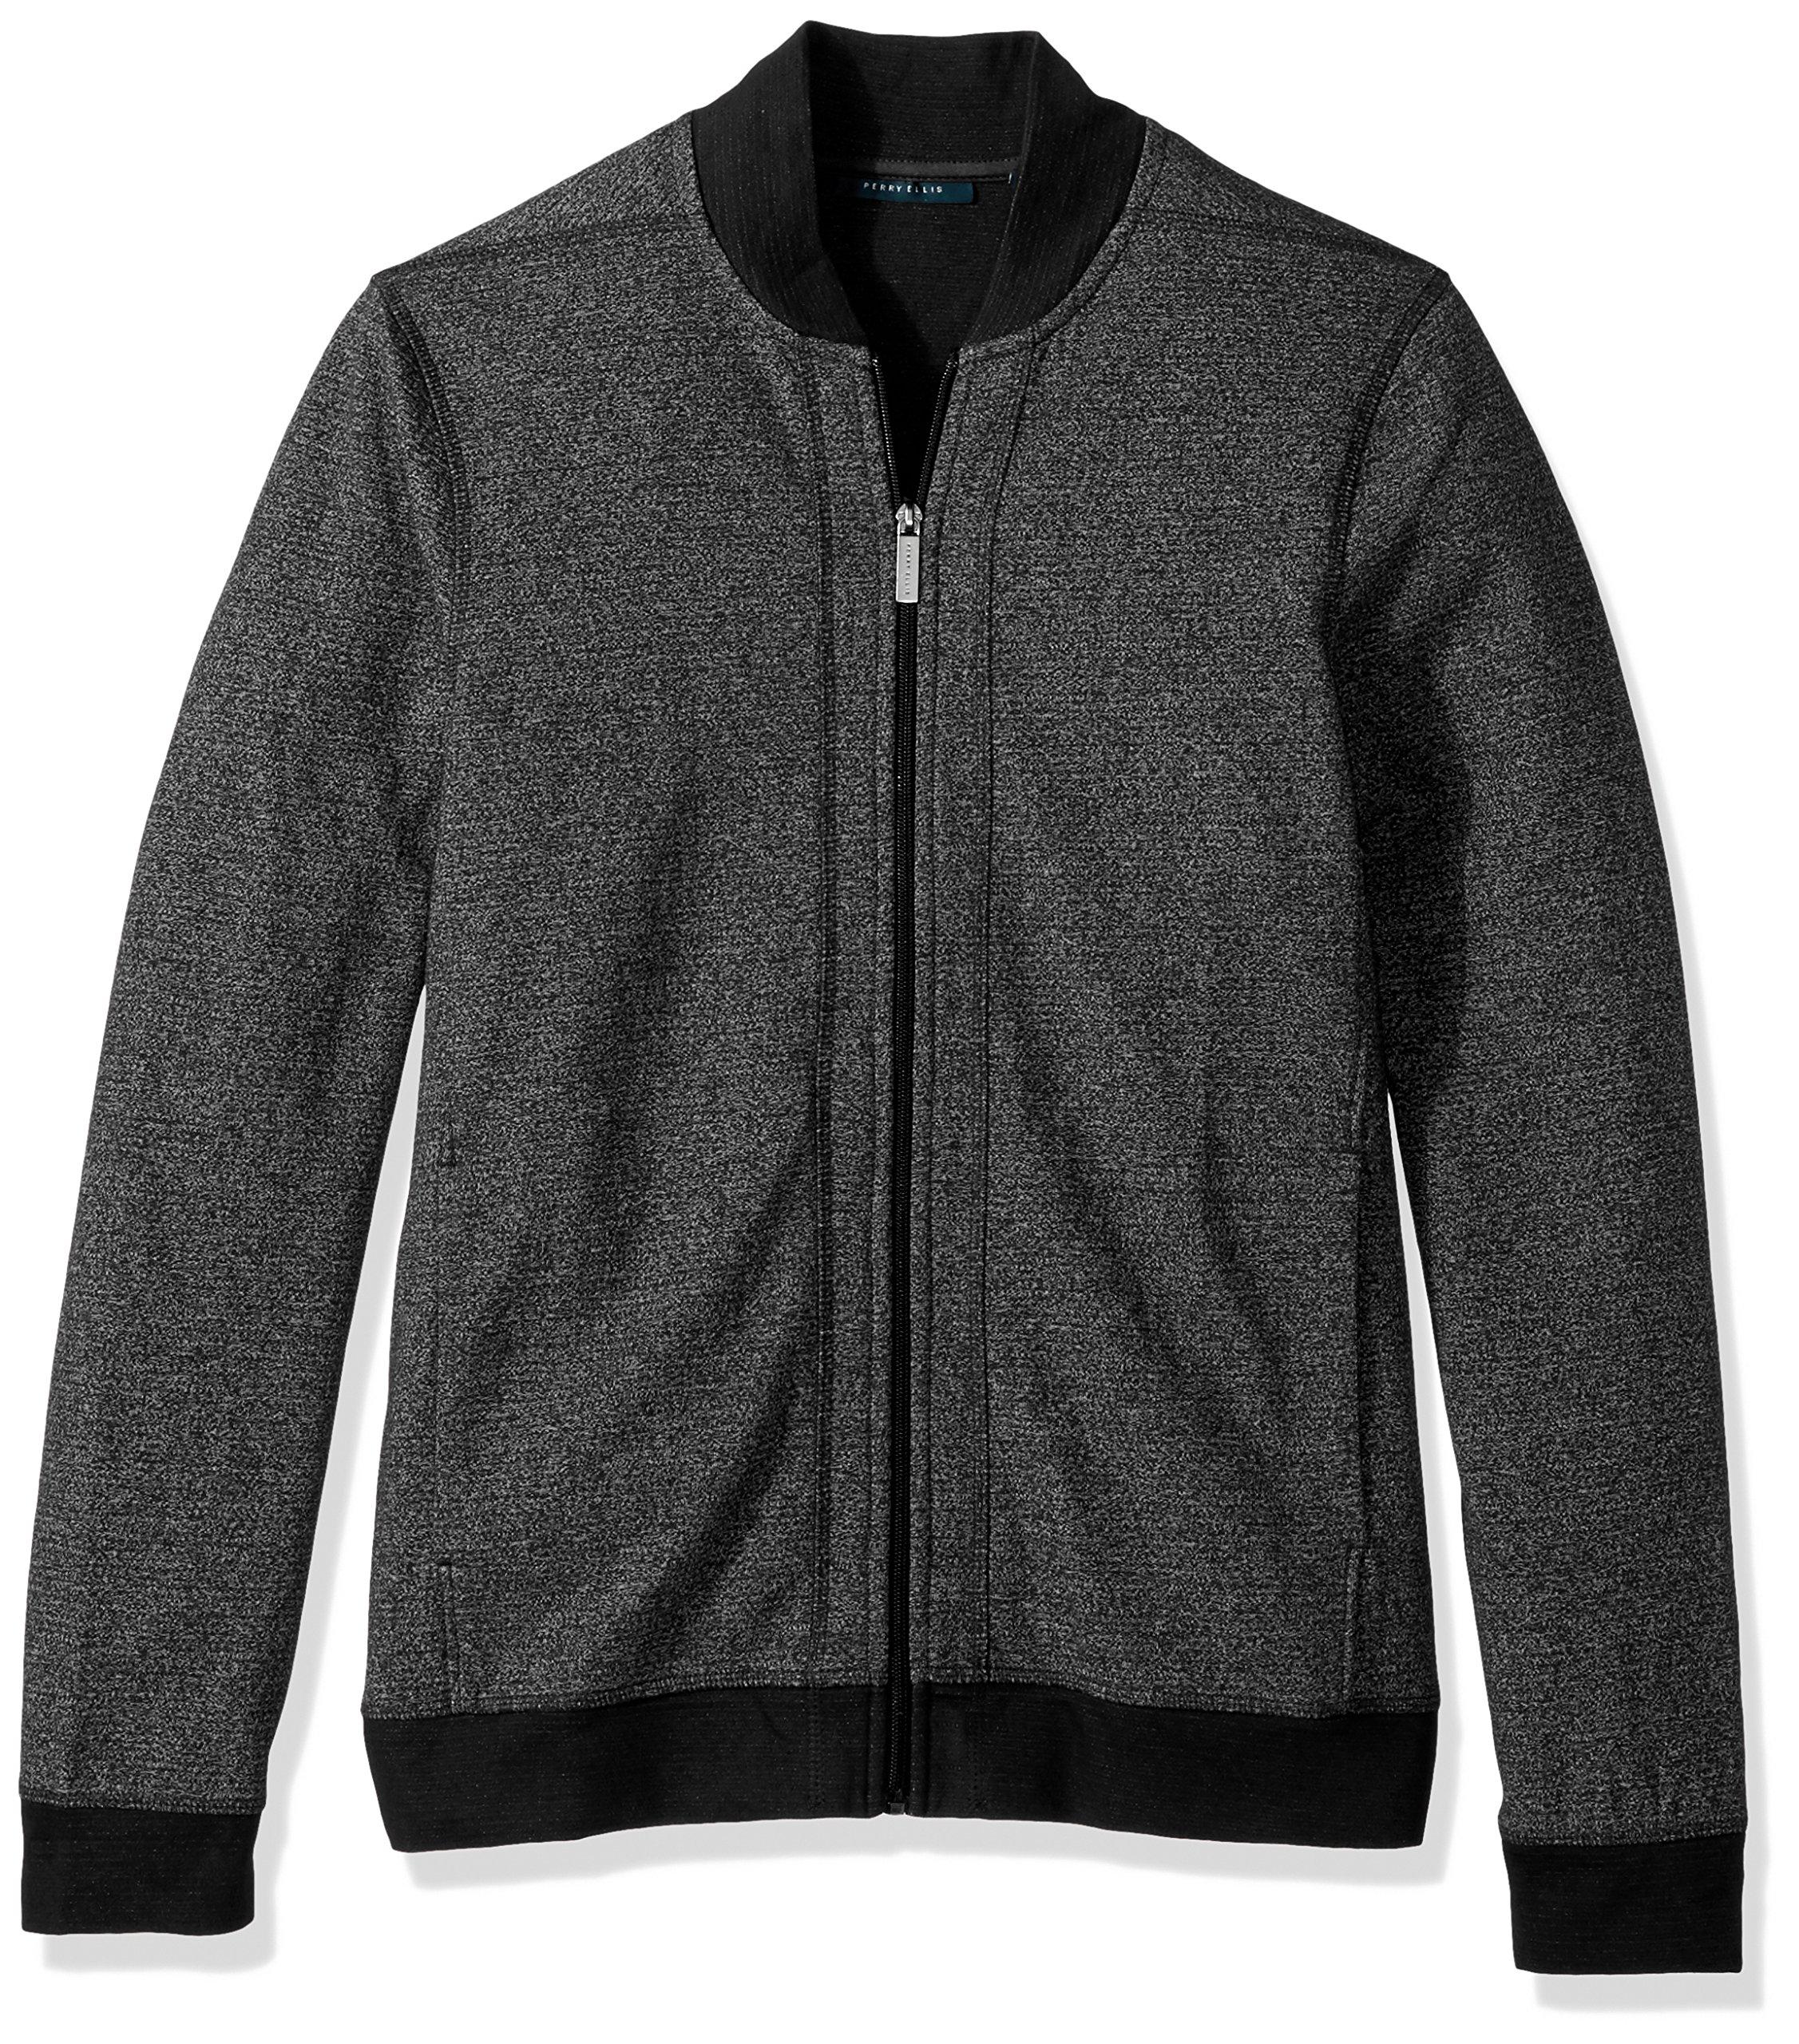 Perry Ellis Men's Texture Bomber Knit Jacket, Charcoal Heather, Small